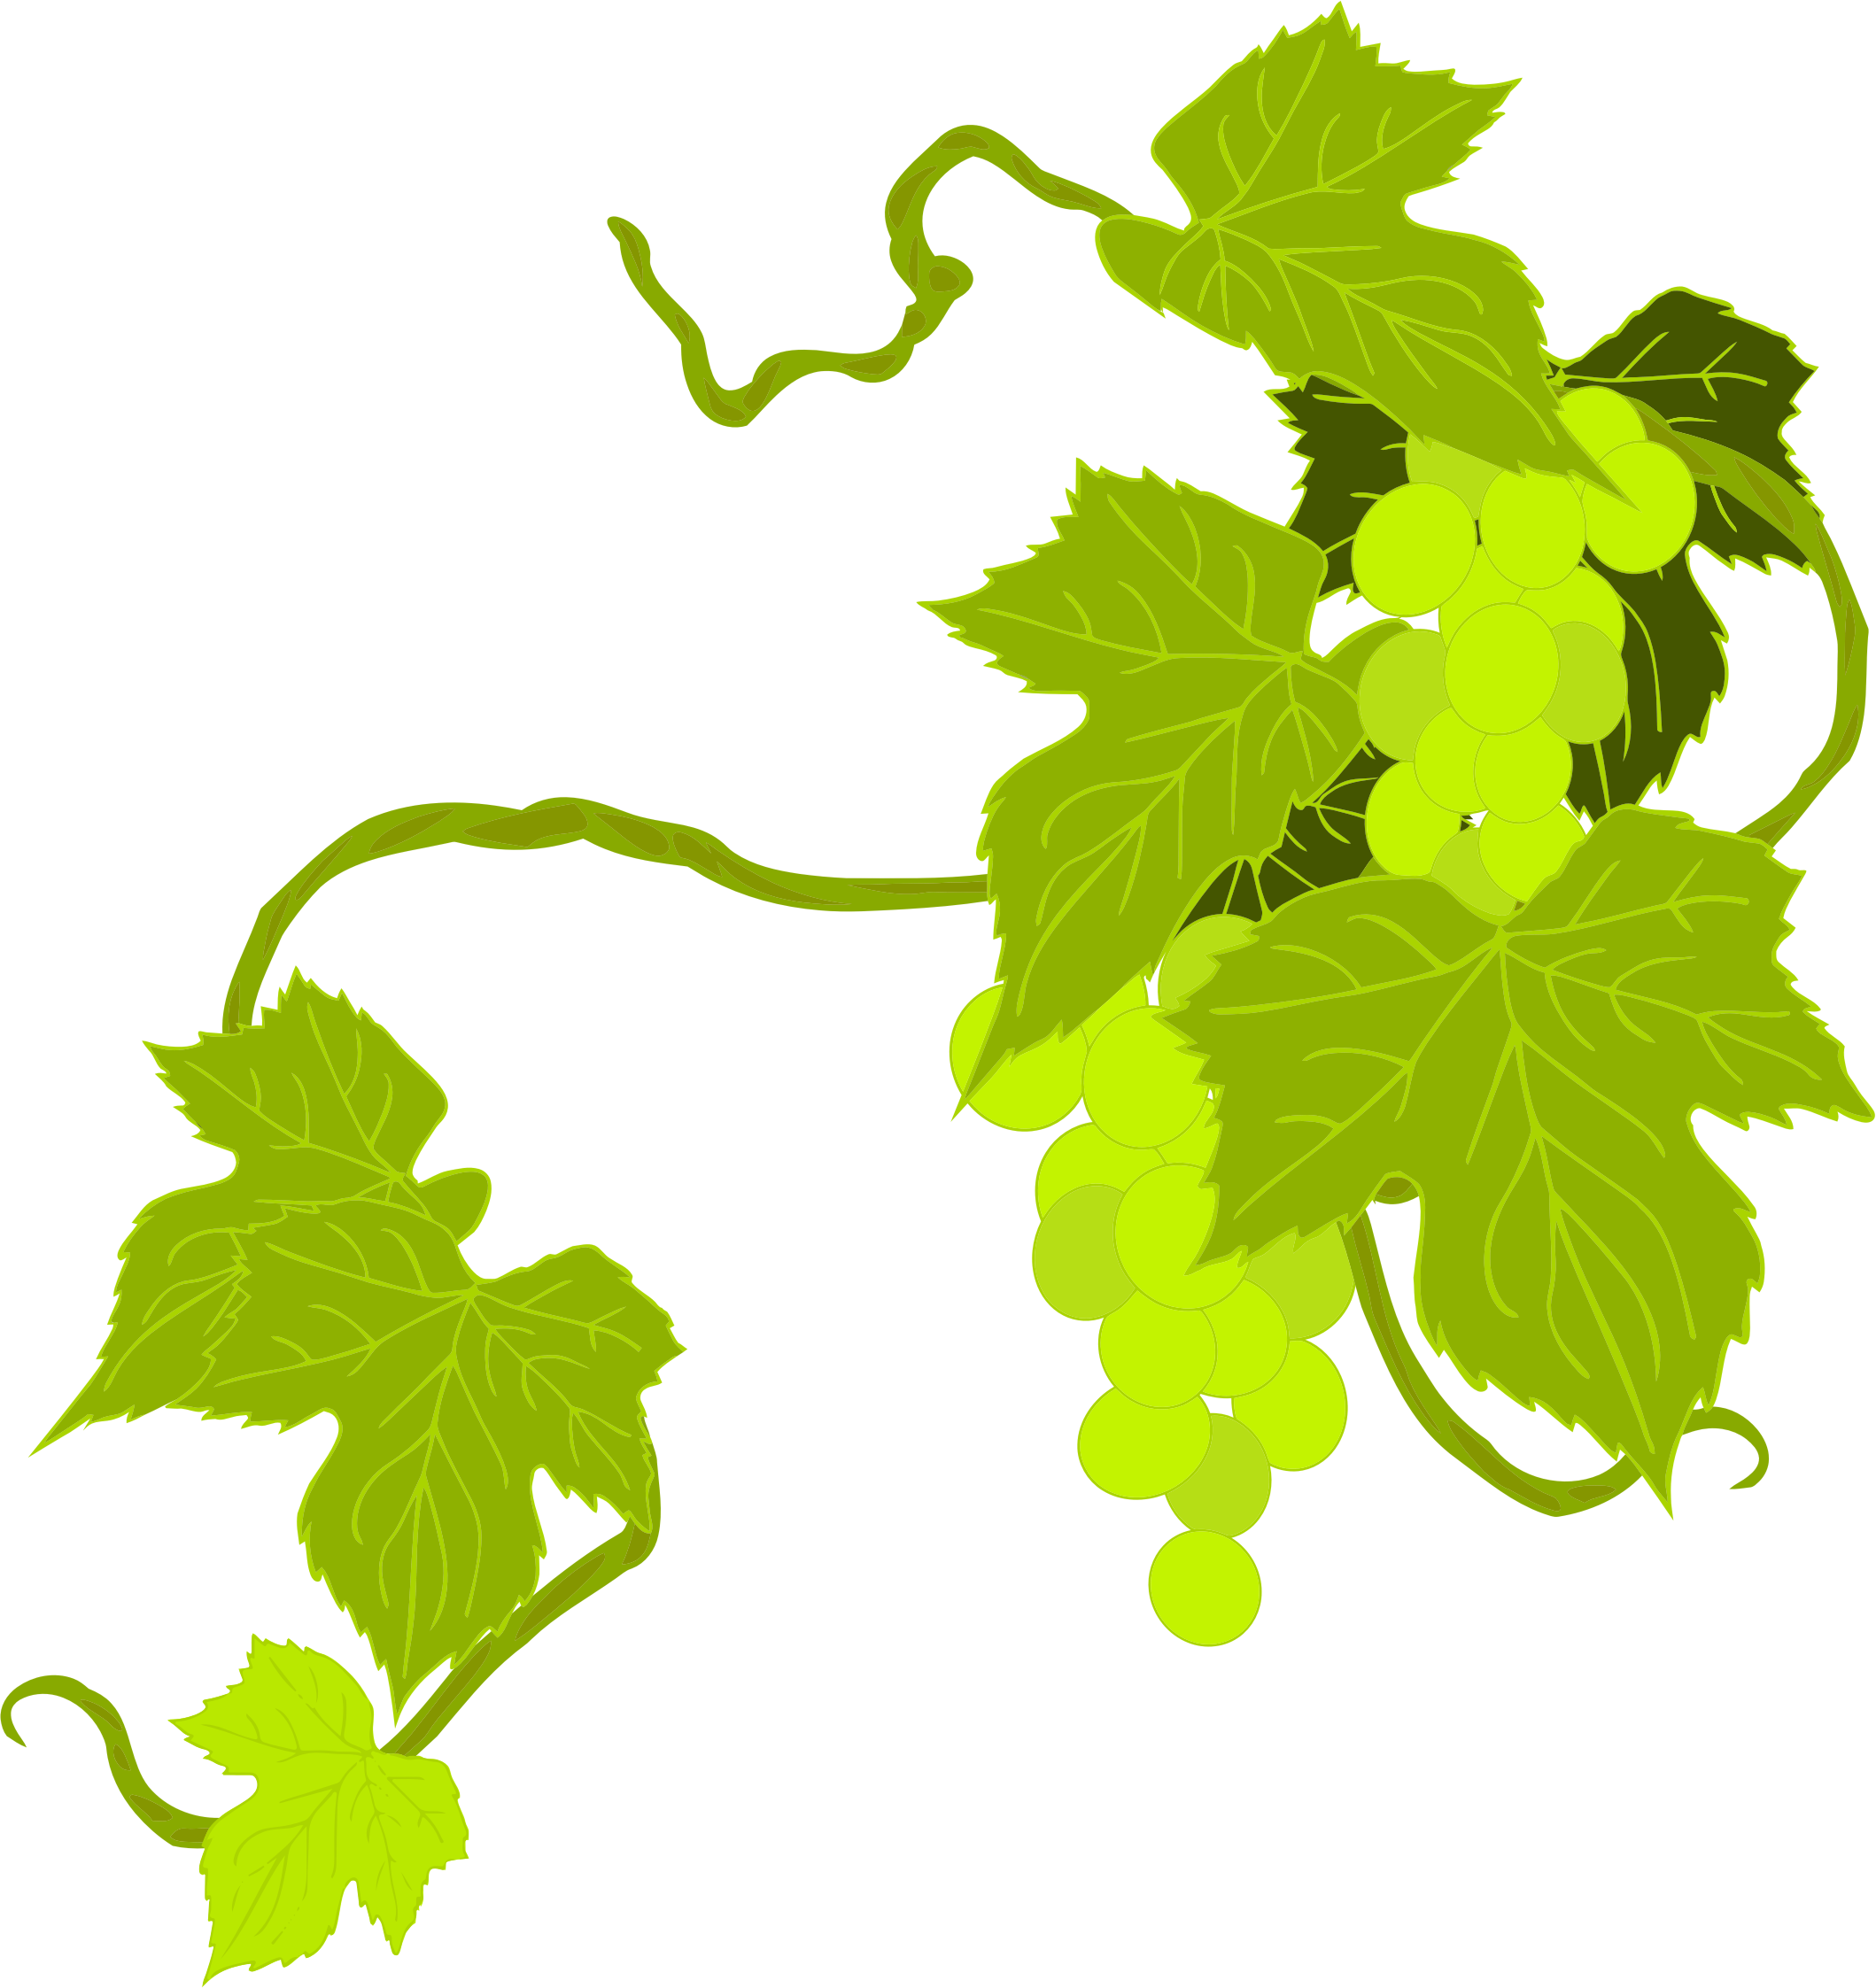 Big image png. Grapes clipart illustration